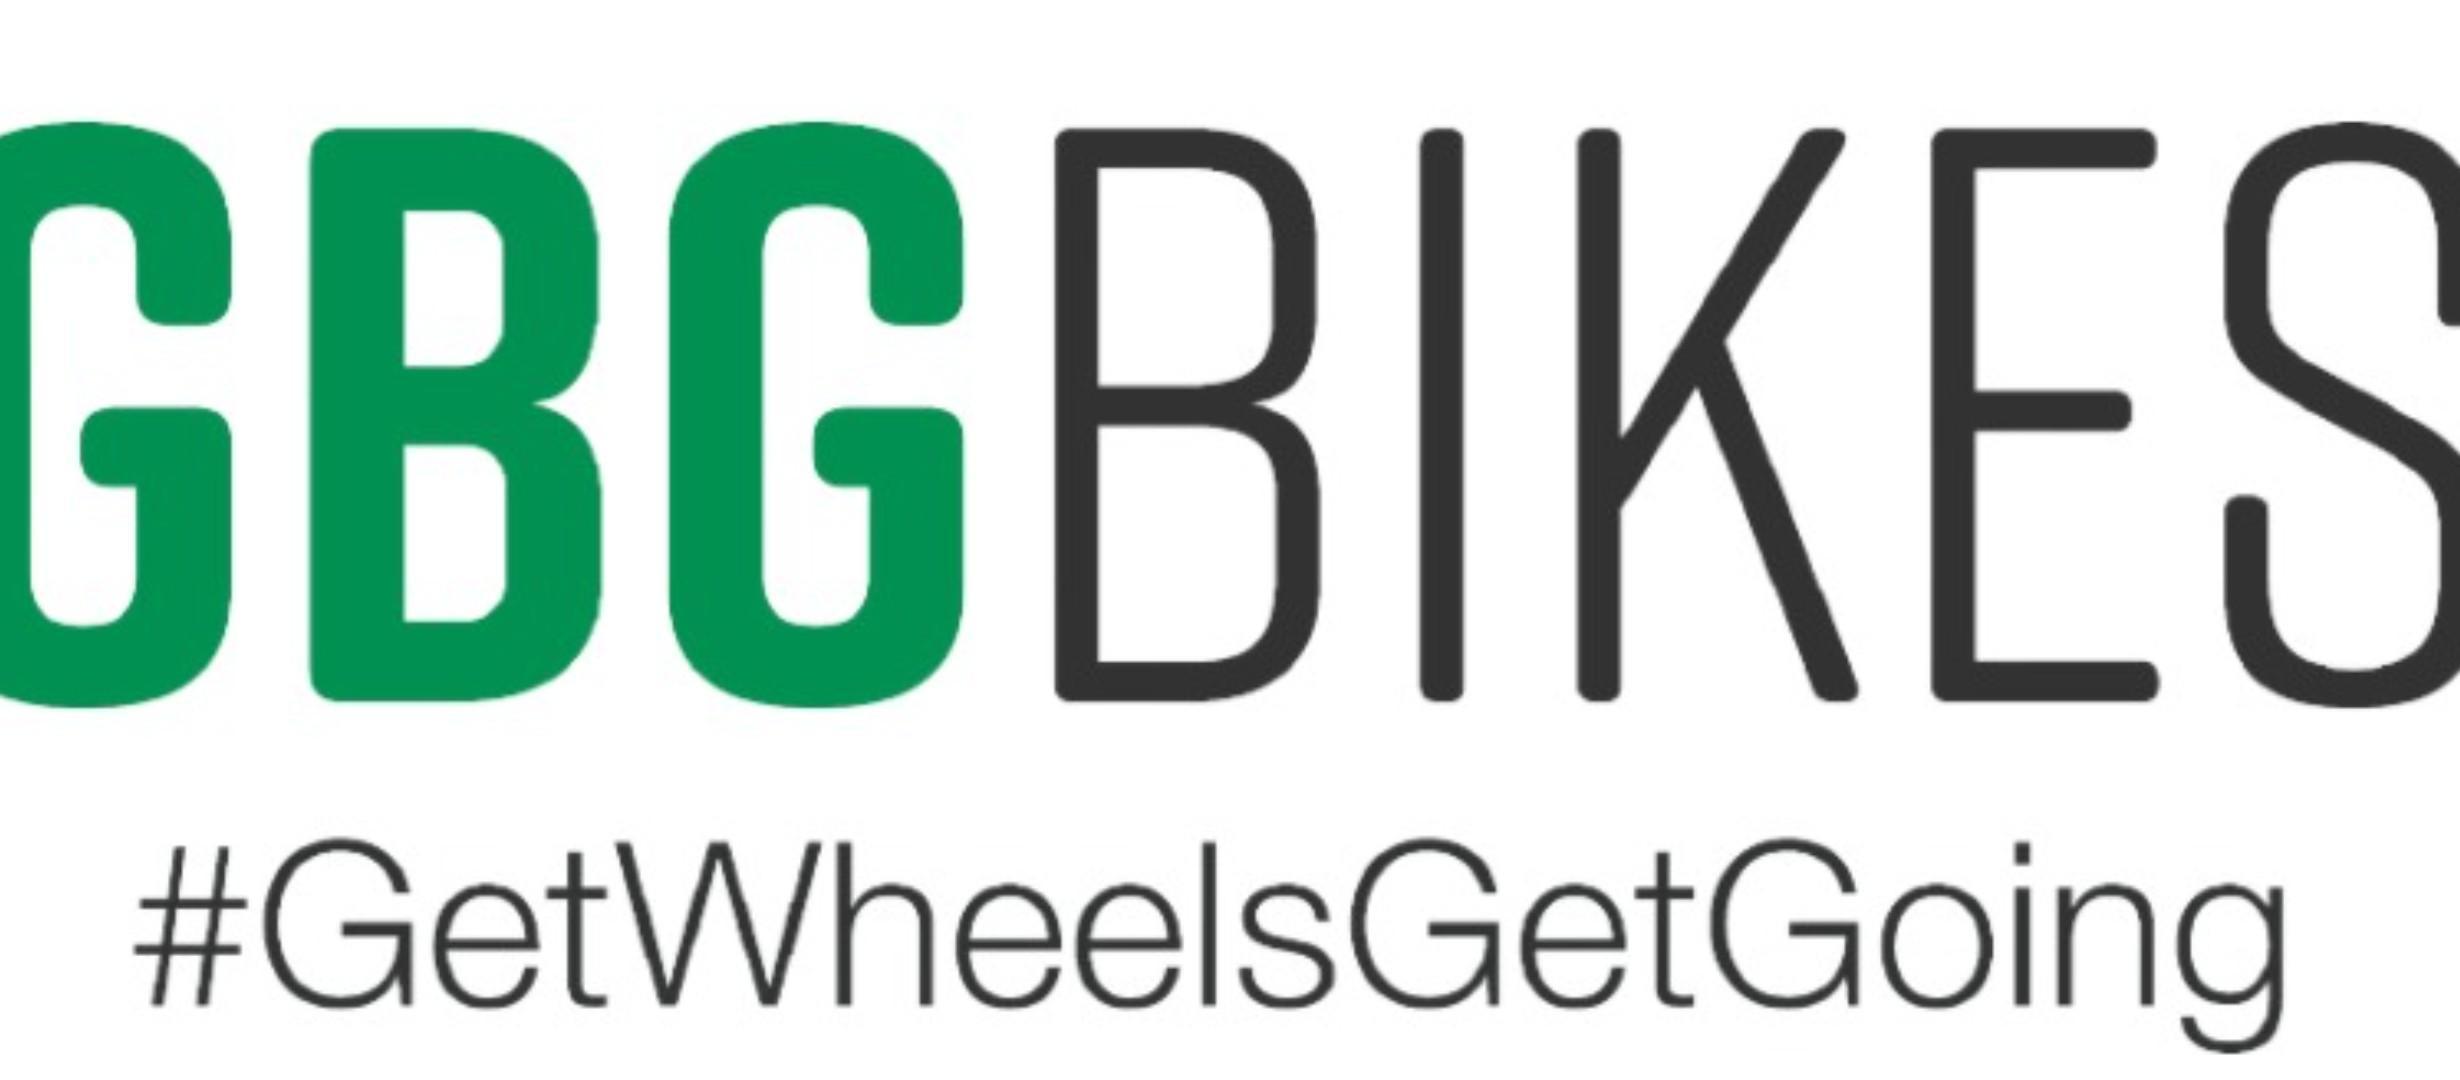 GBG Bikes logo and slogan